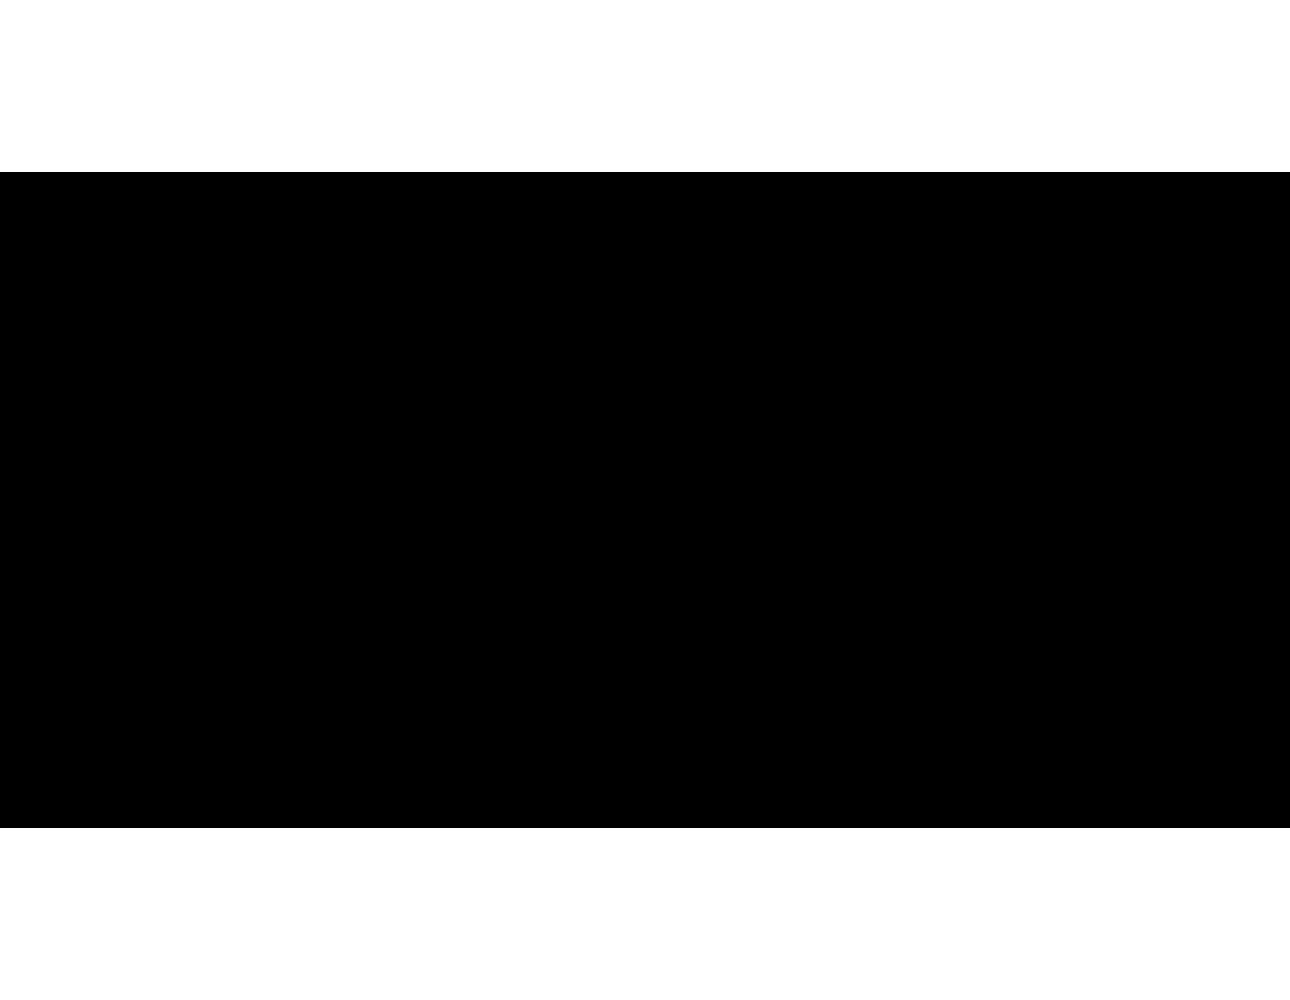 Less Frizz - Multivisi